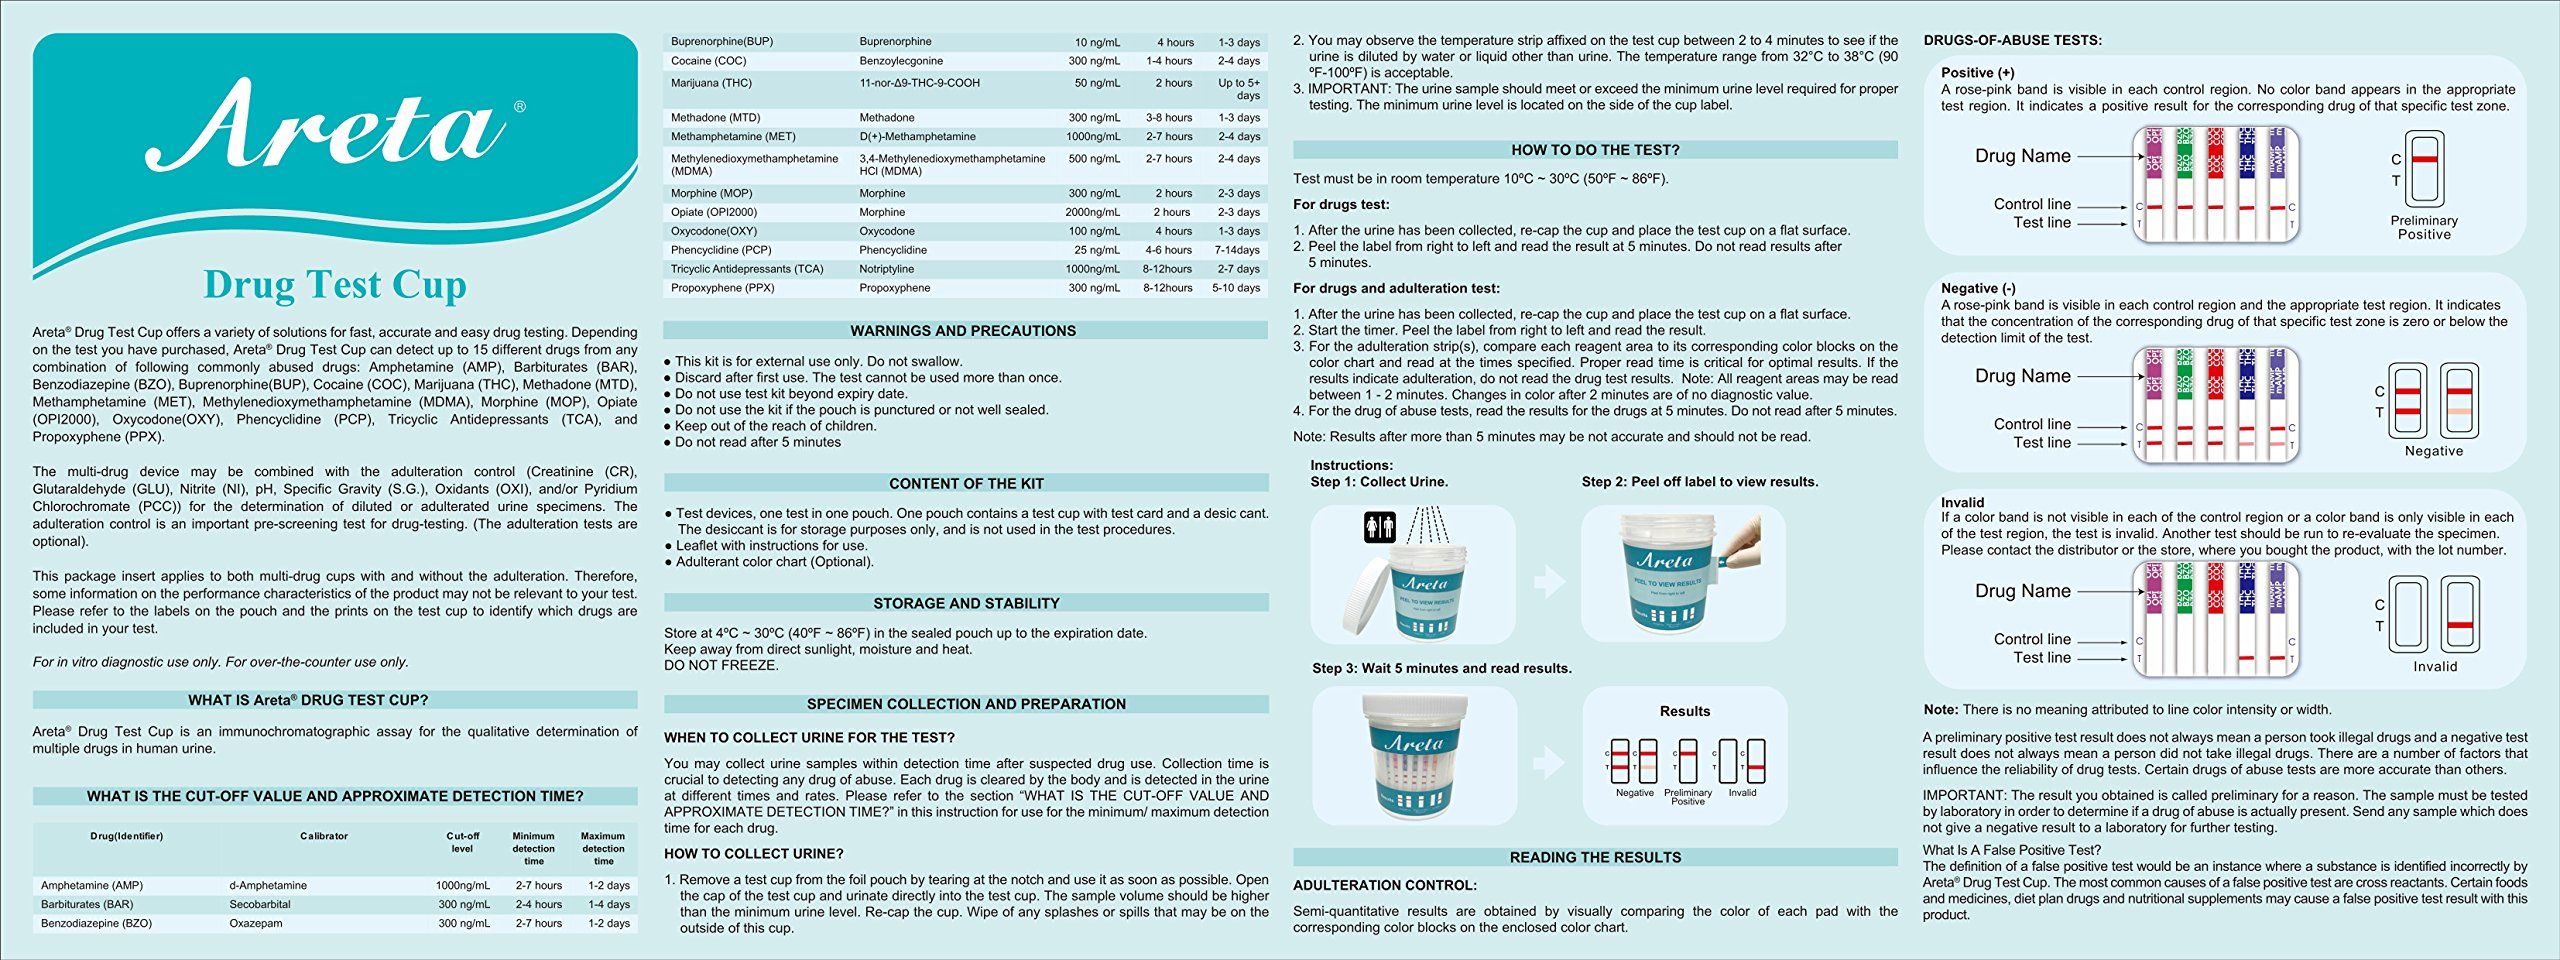 50 Pack Areta 5 Panel Instant Drug Test Cup - Marijuana (THC),Cocaine (COC),Opiate (OPI 2000),Benzodiazepines (BZO), Amphetamine (AMP)- #ACDOA-754 by Areta (Image #4)